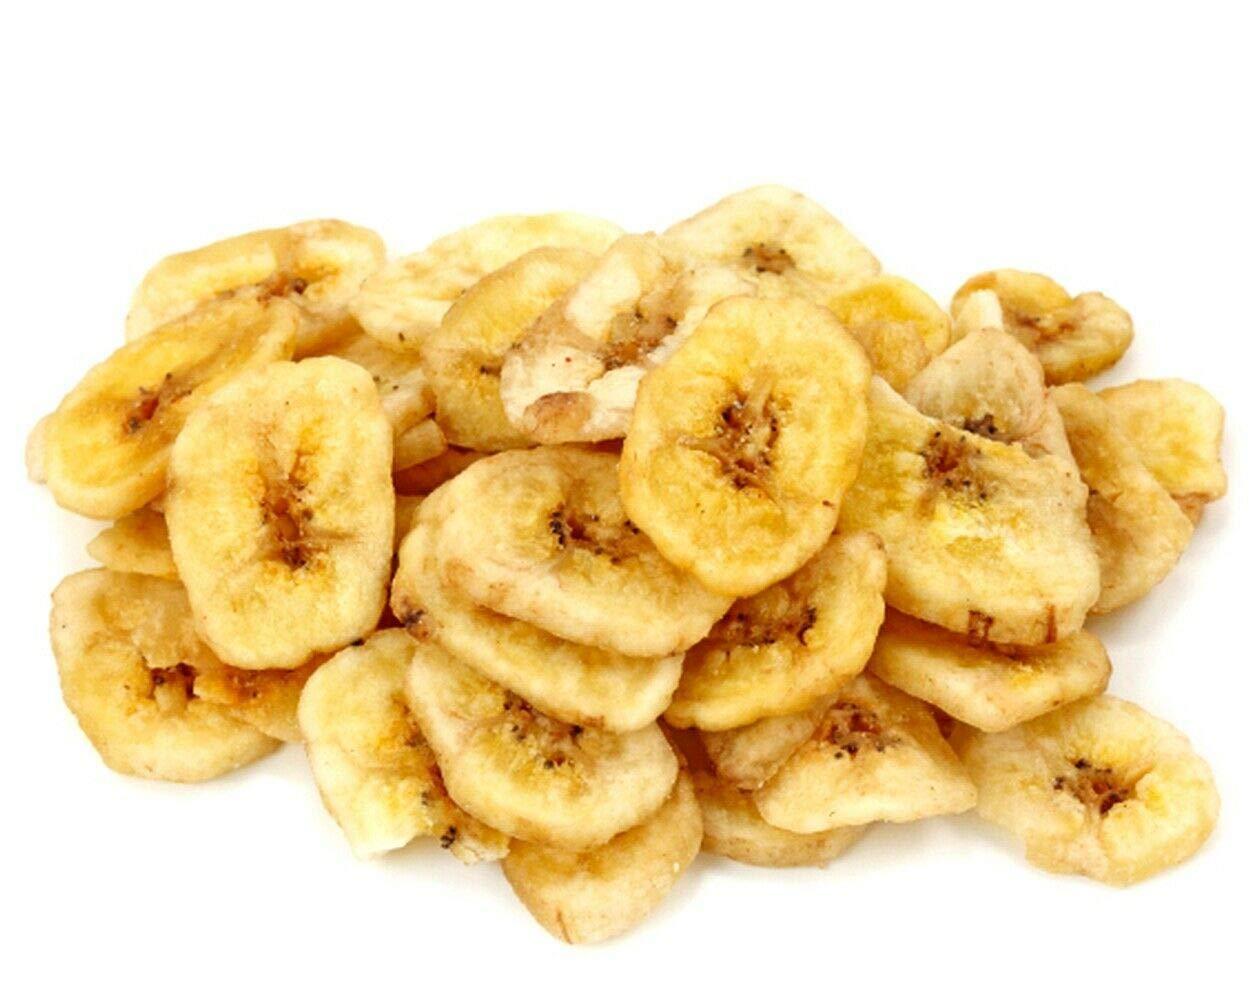 Bulk Sweetened Banana Chips Wholesale Box Pound 10 Max 76% OFF Jacksonville Mall